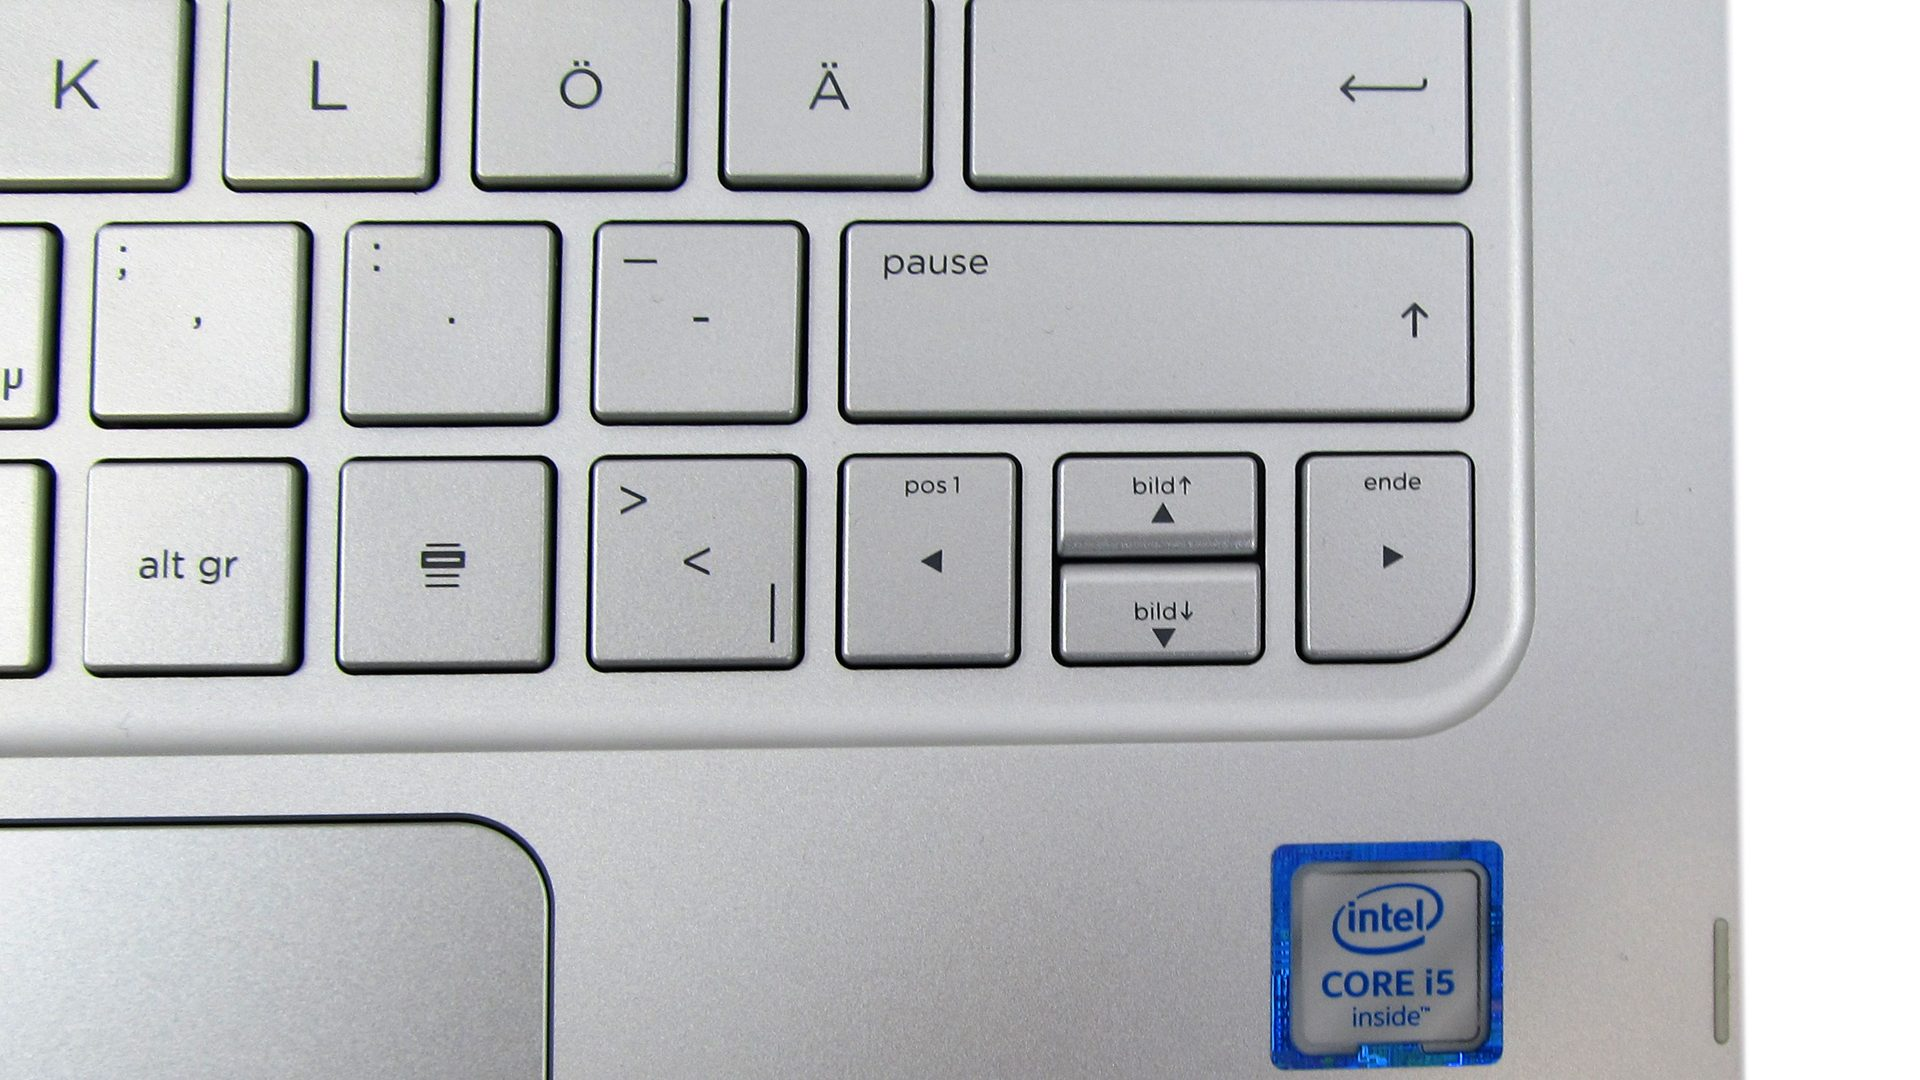 hp_spectre_13_x360_tastatur2